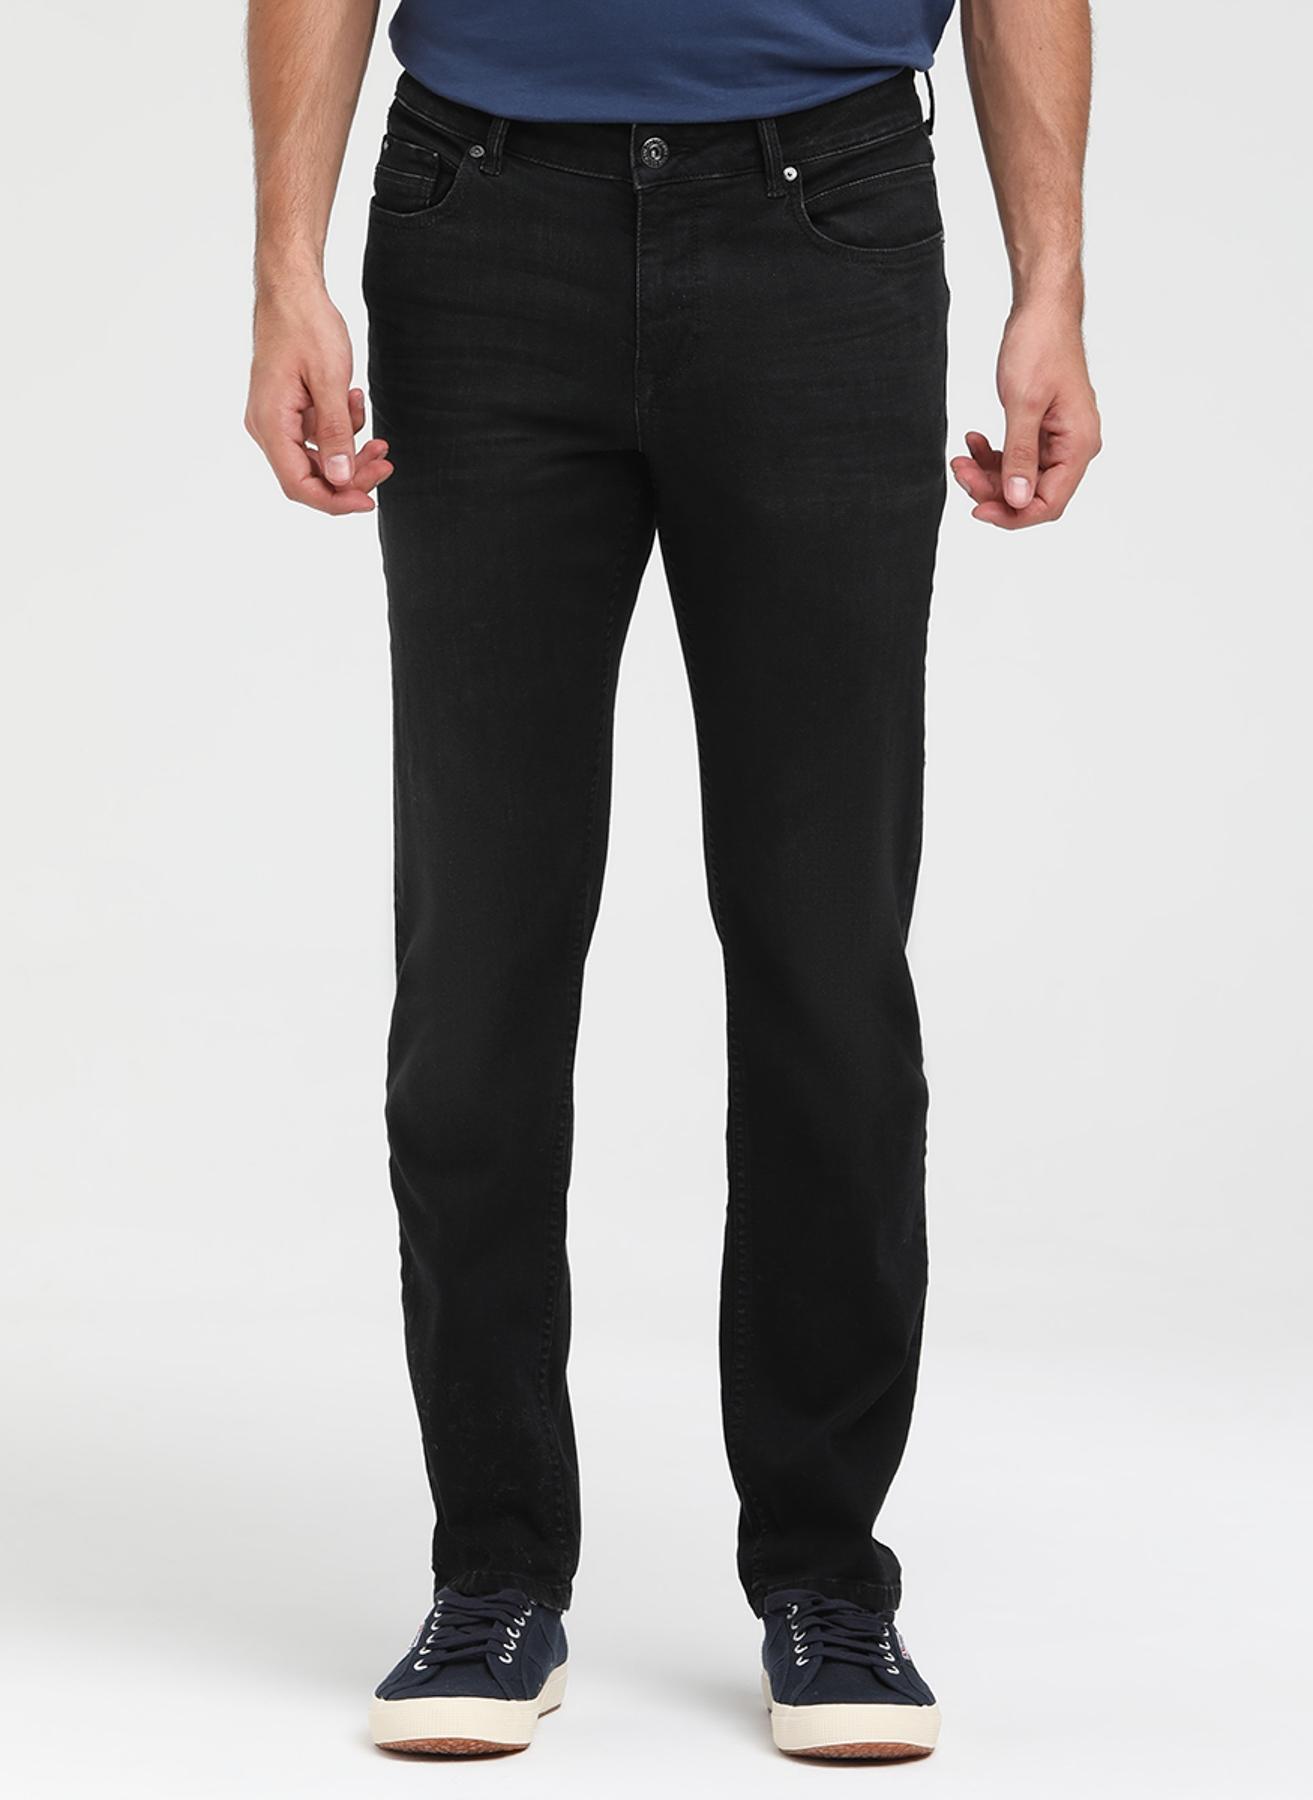 Lee Cooper Jagger Klasik Pantolon 33-34 5000200288015 Ürün Resmi